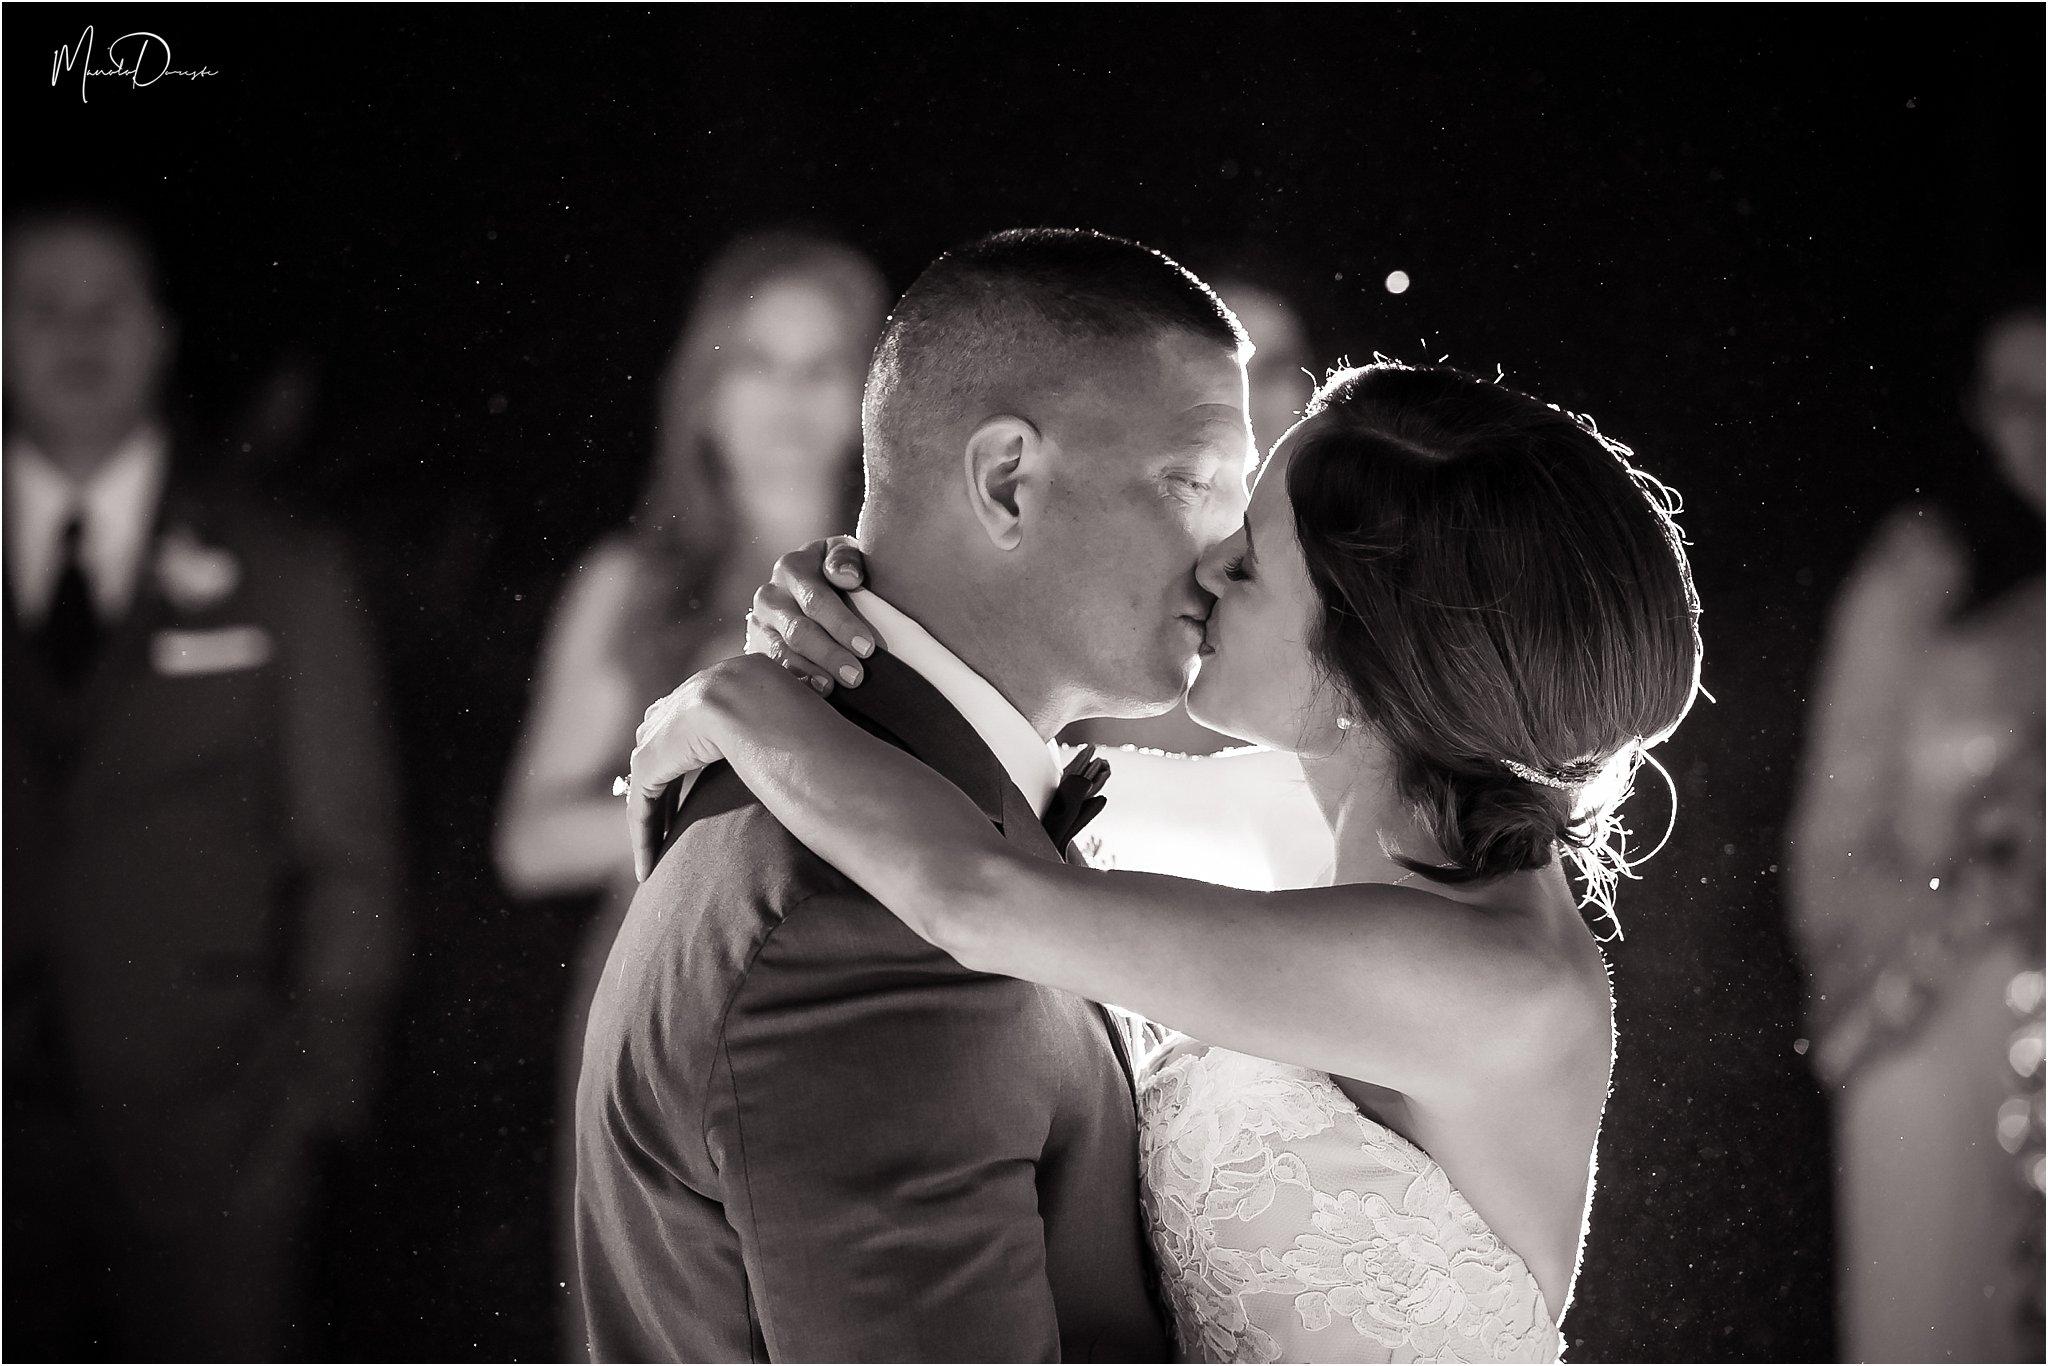 00846_ManoloDoreste_InFocusStudios_Wedding_Family_Photography_Miami_MiamiPhotographer.jpg